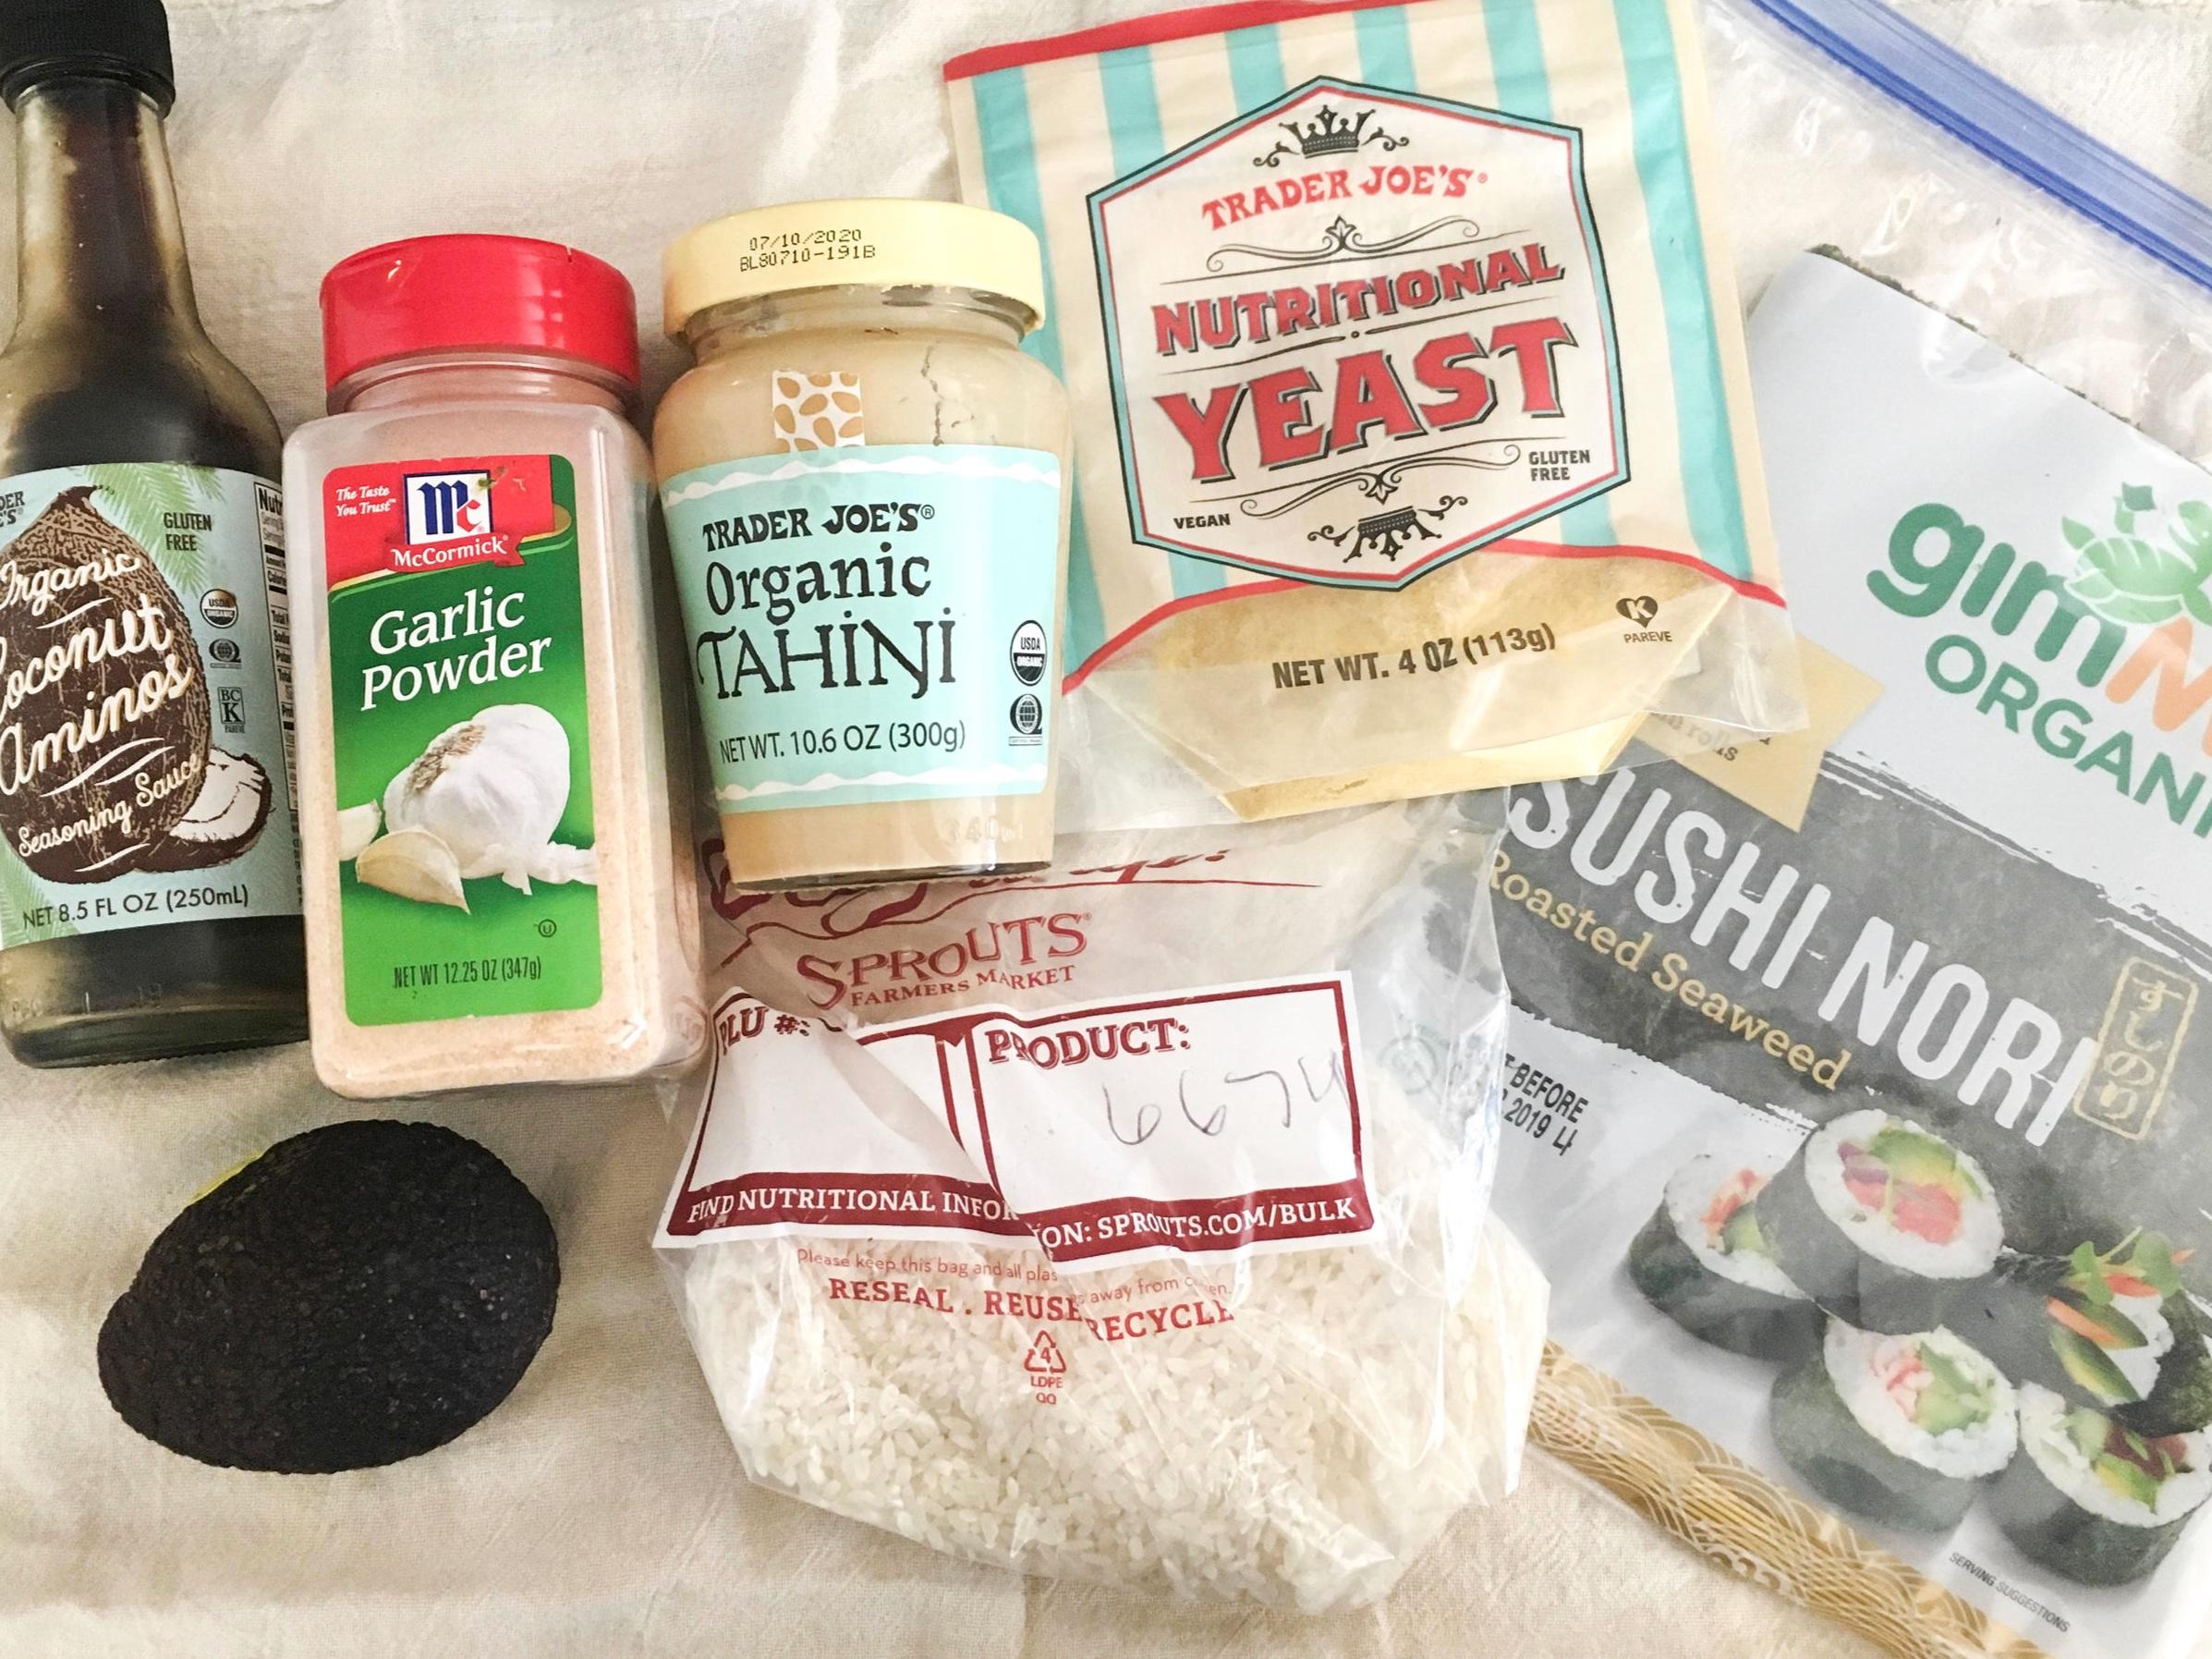 I love Trader Joe's Organic Coconut Aminos, Organic Tahini, and Nutritional Yeast.